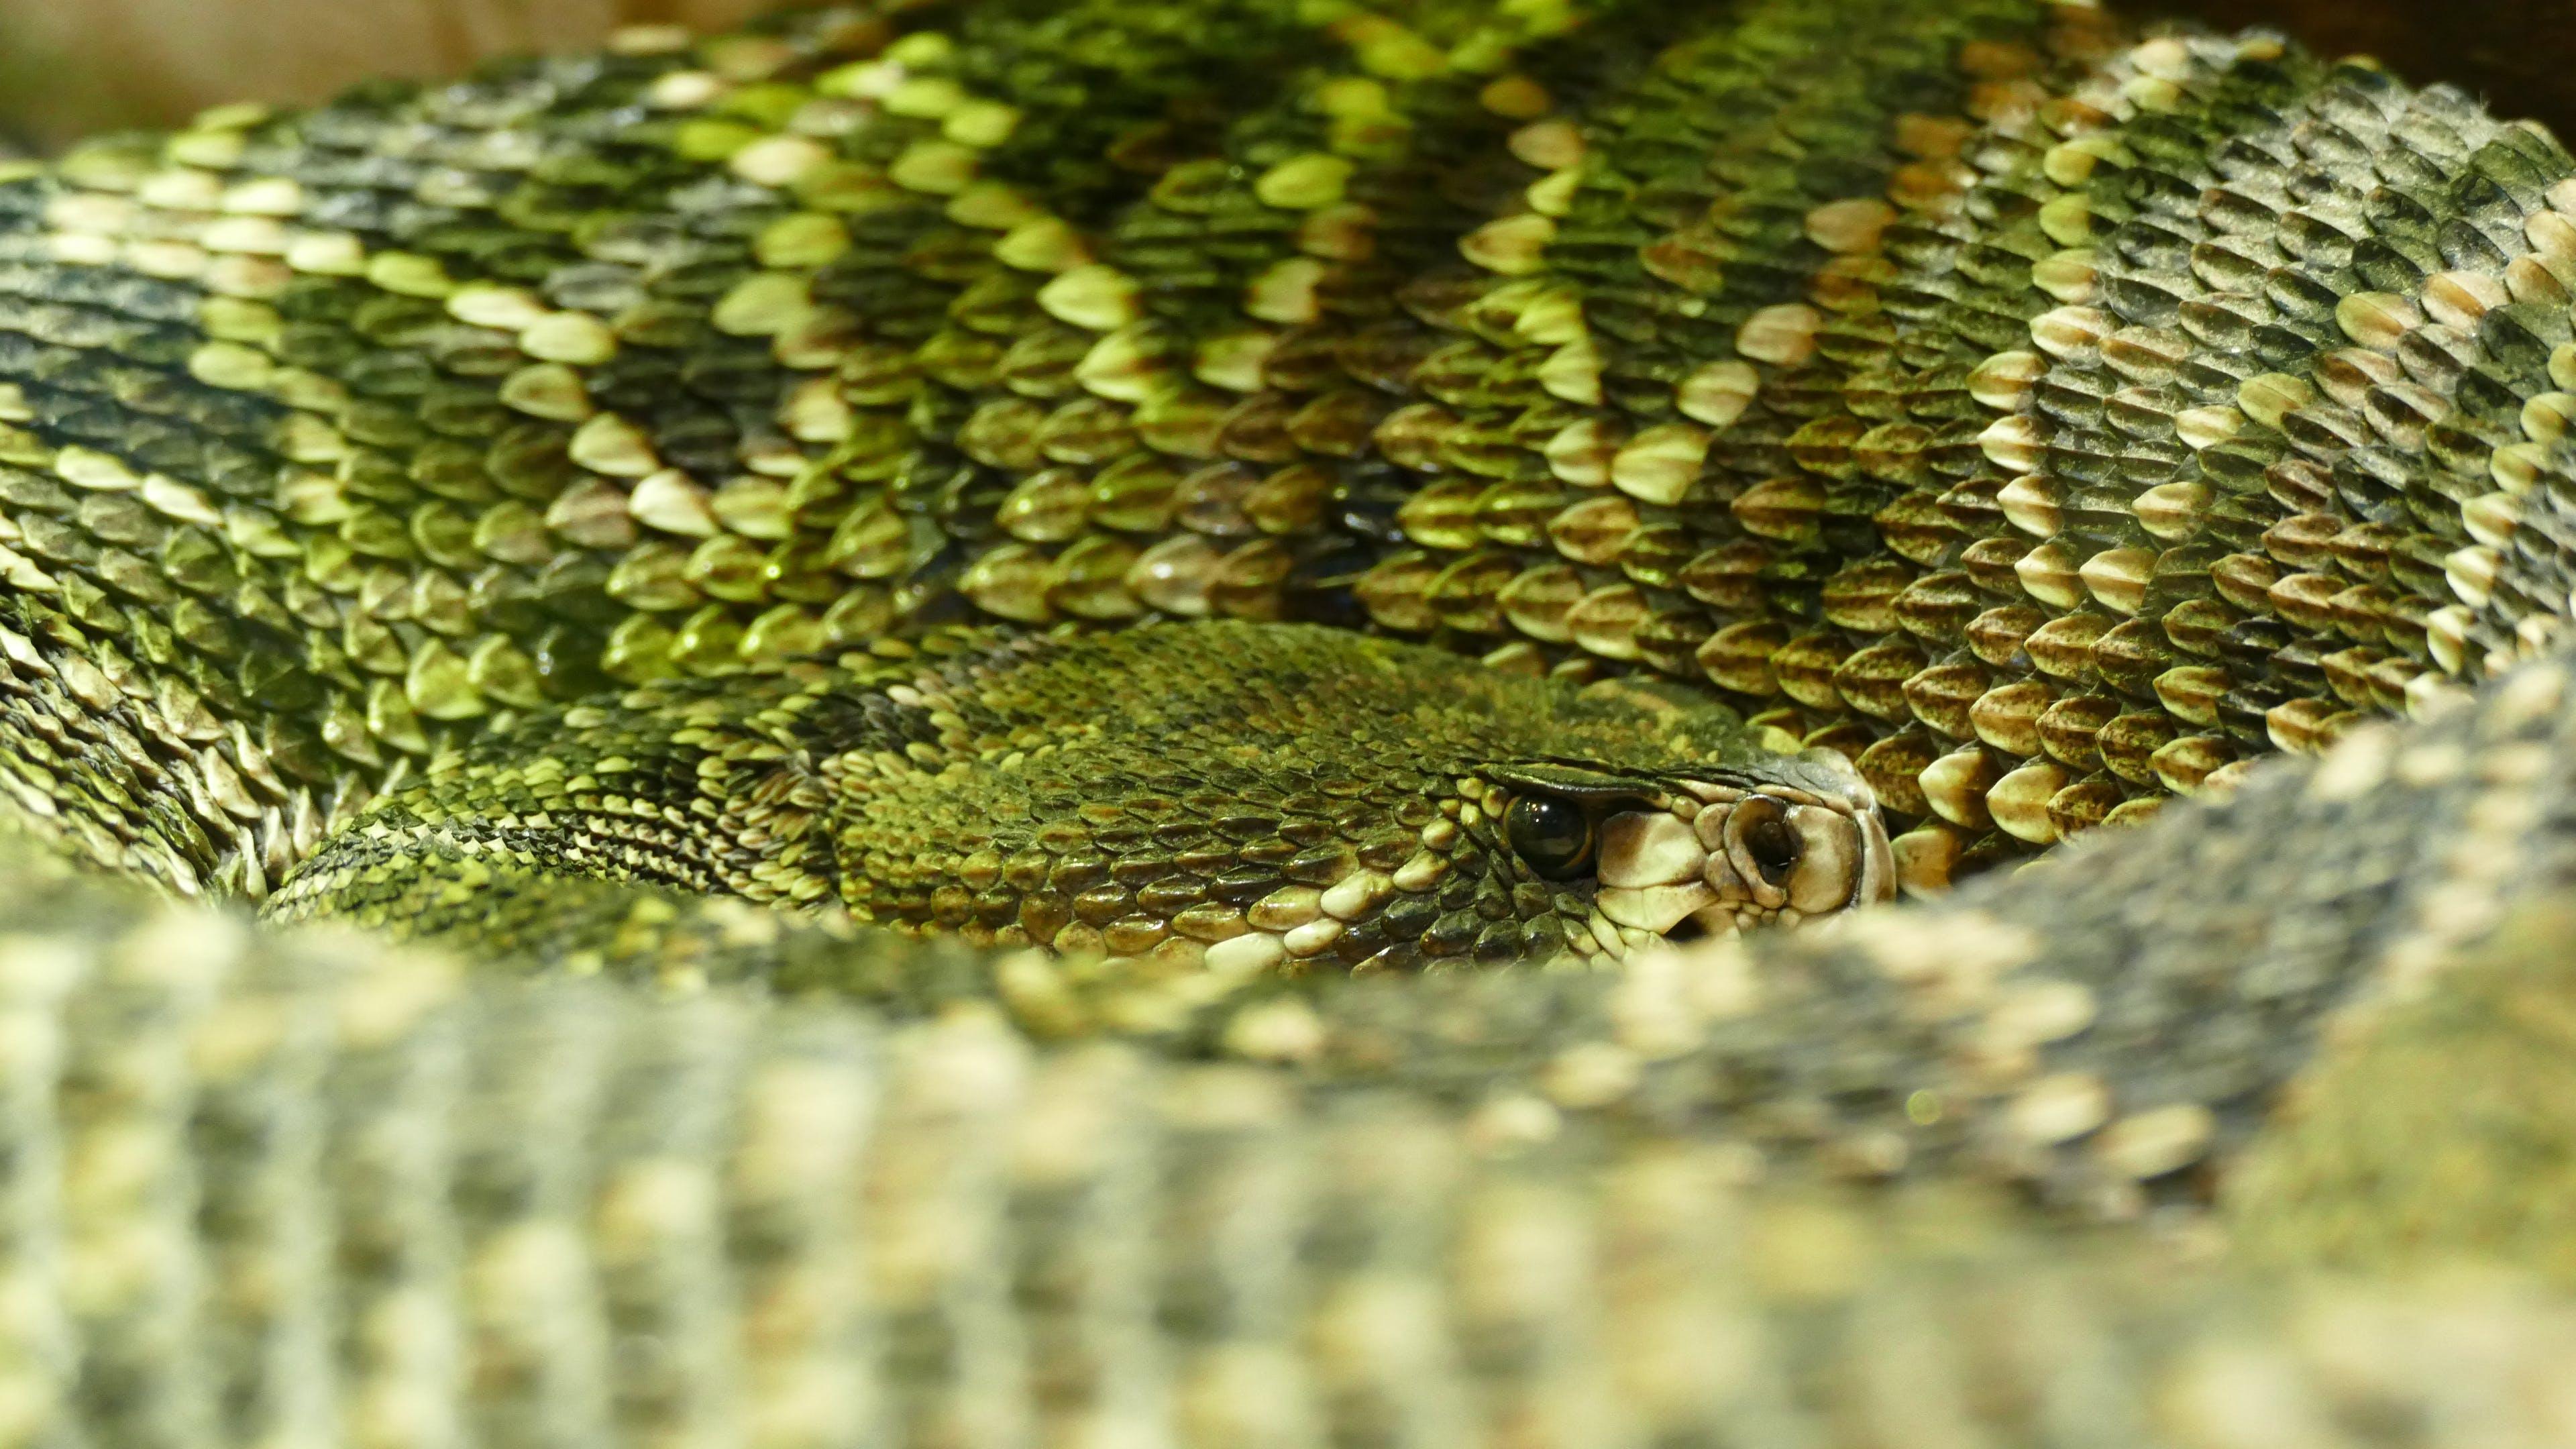 animal, animal photography, camouflage